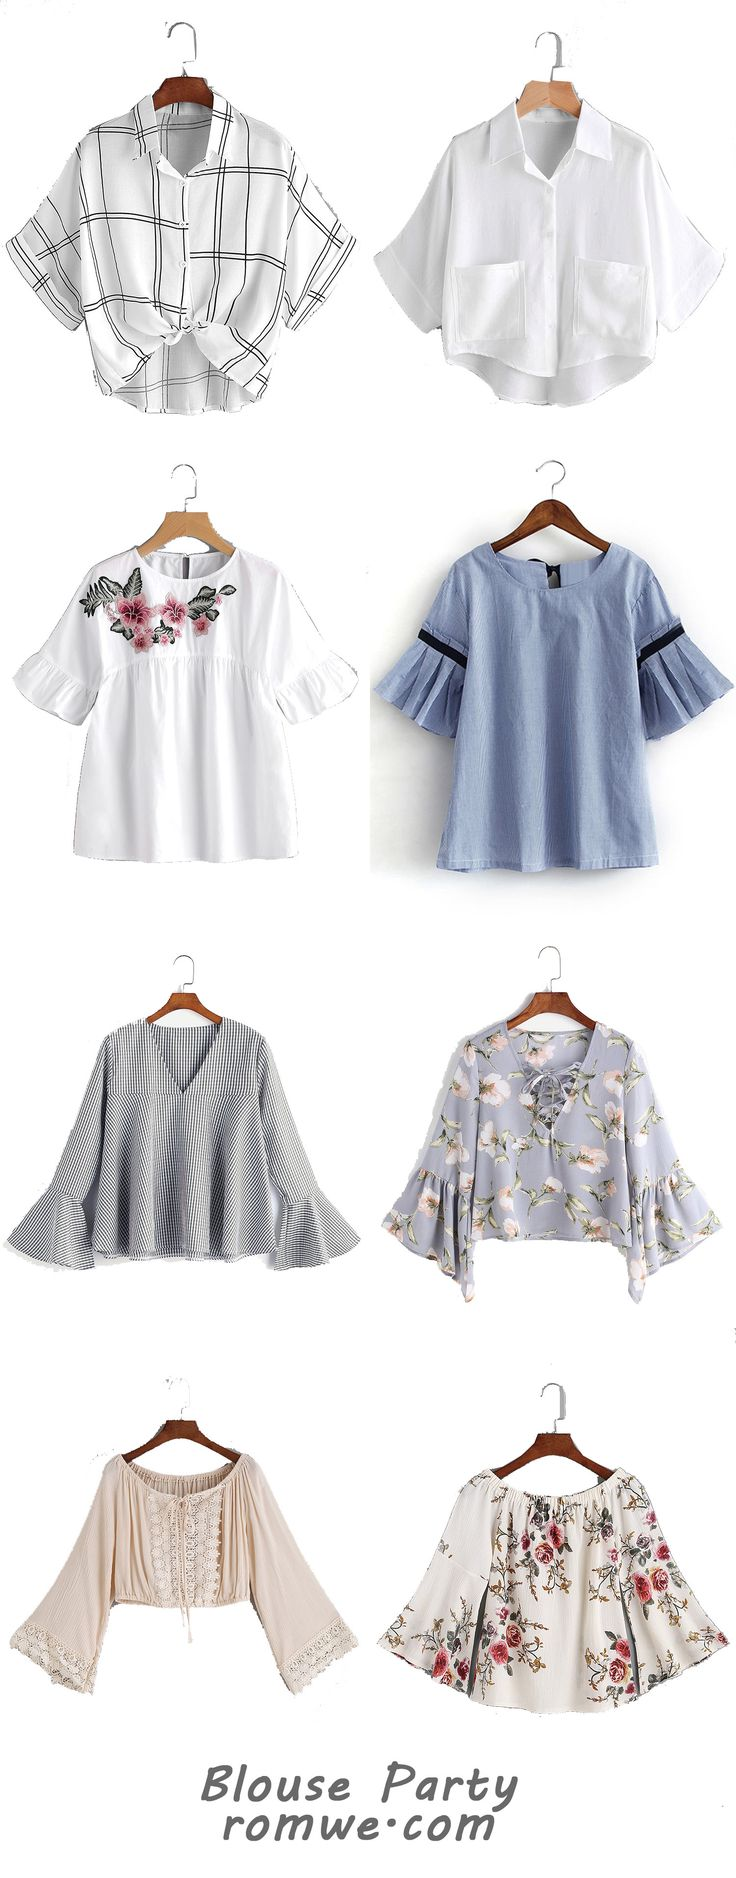 Fashion Blouses Party - romwe.com